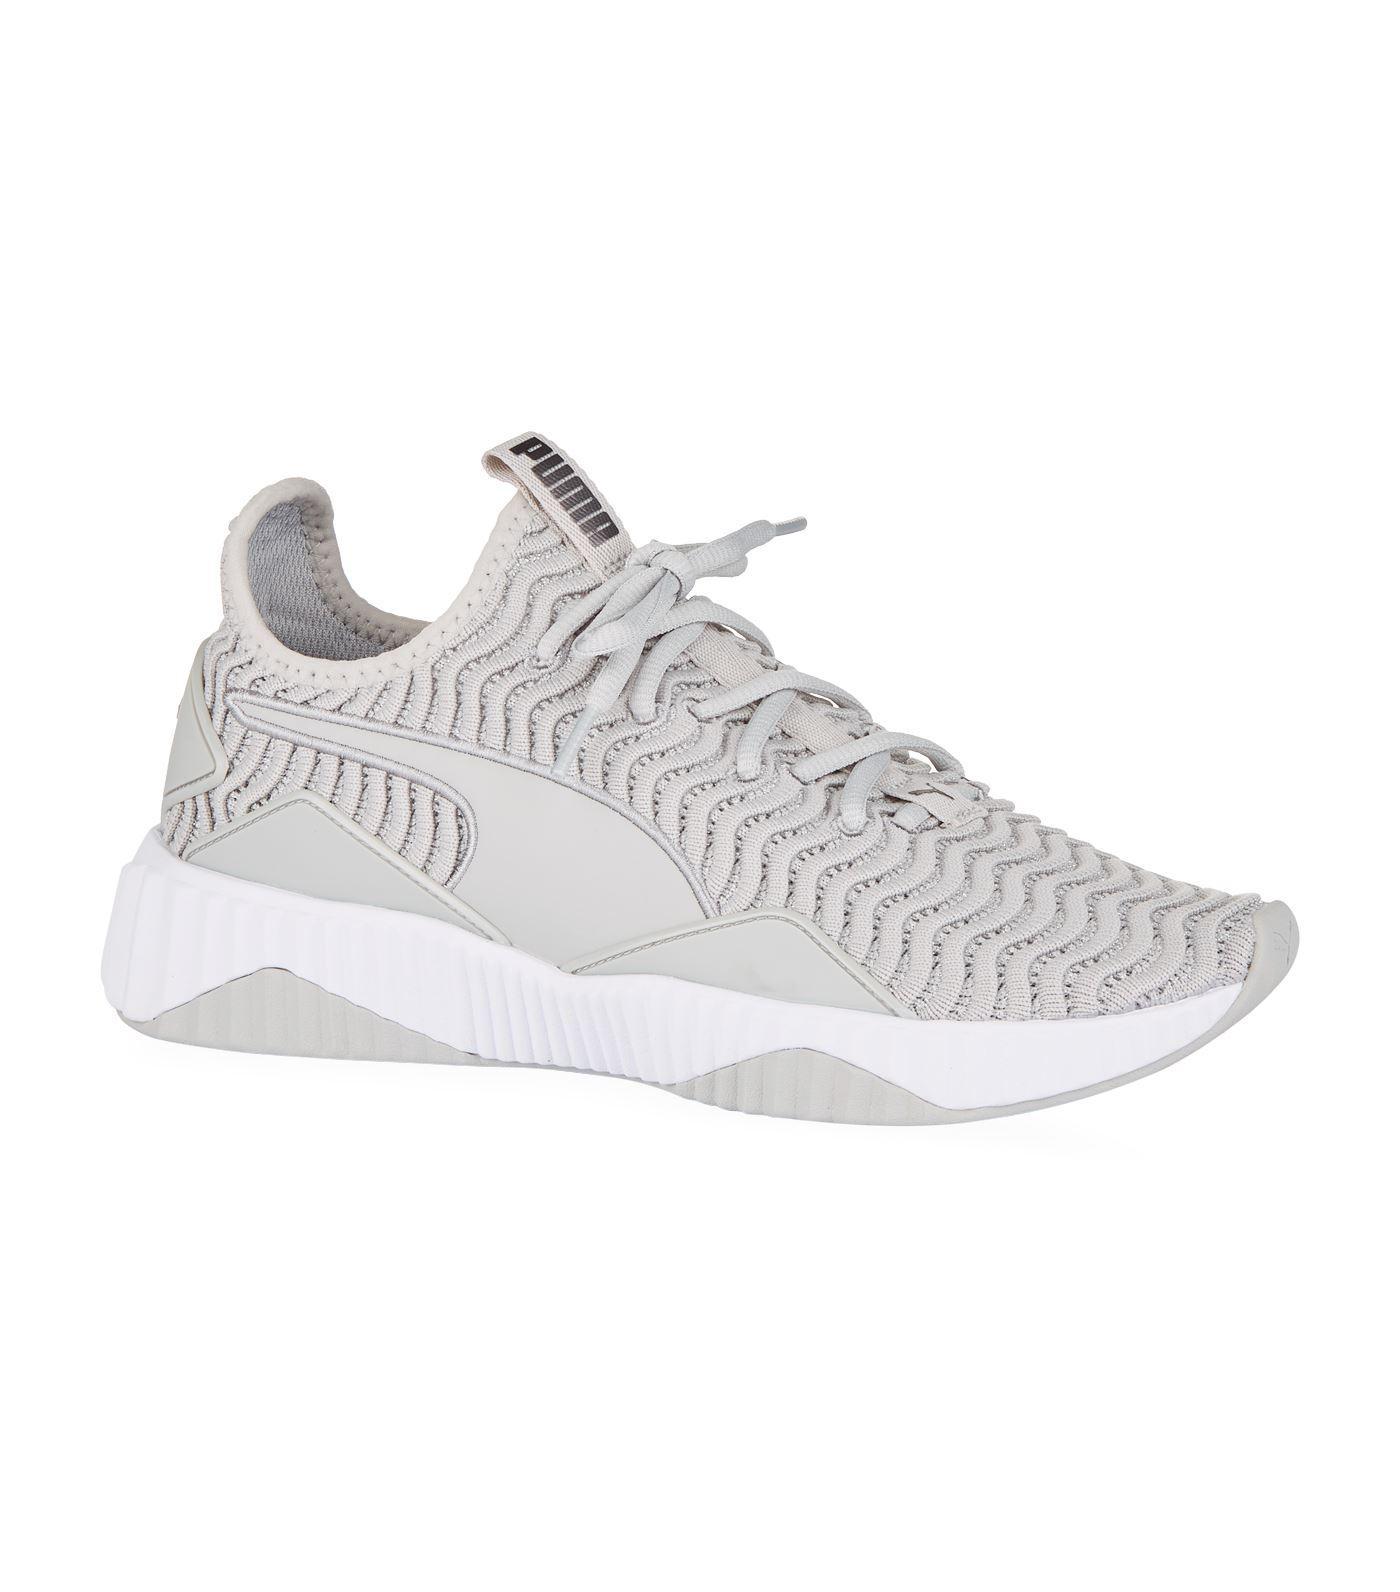 b463b23d10e635 Puma Defy X Sg Sneakers in Gray - Lyst